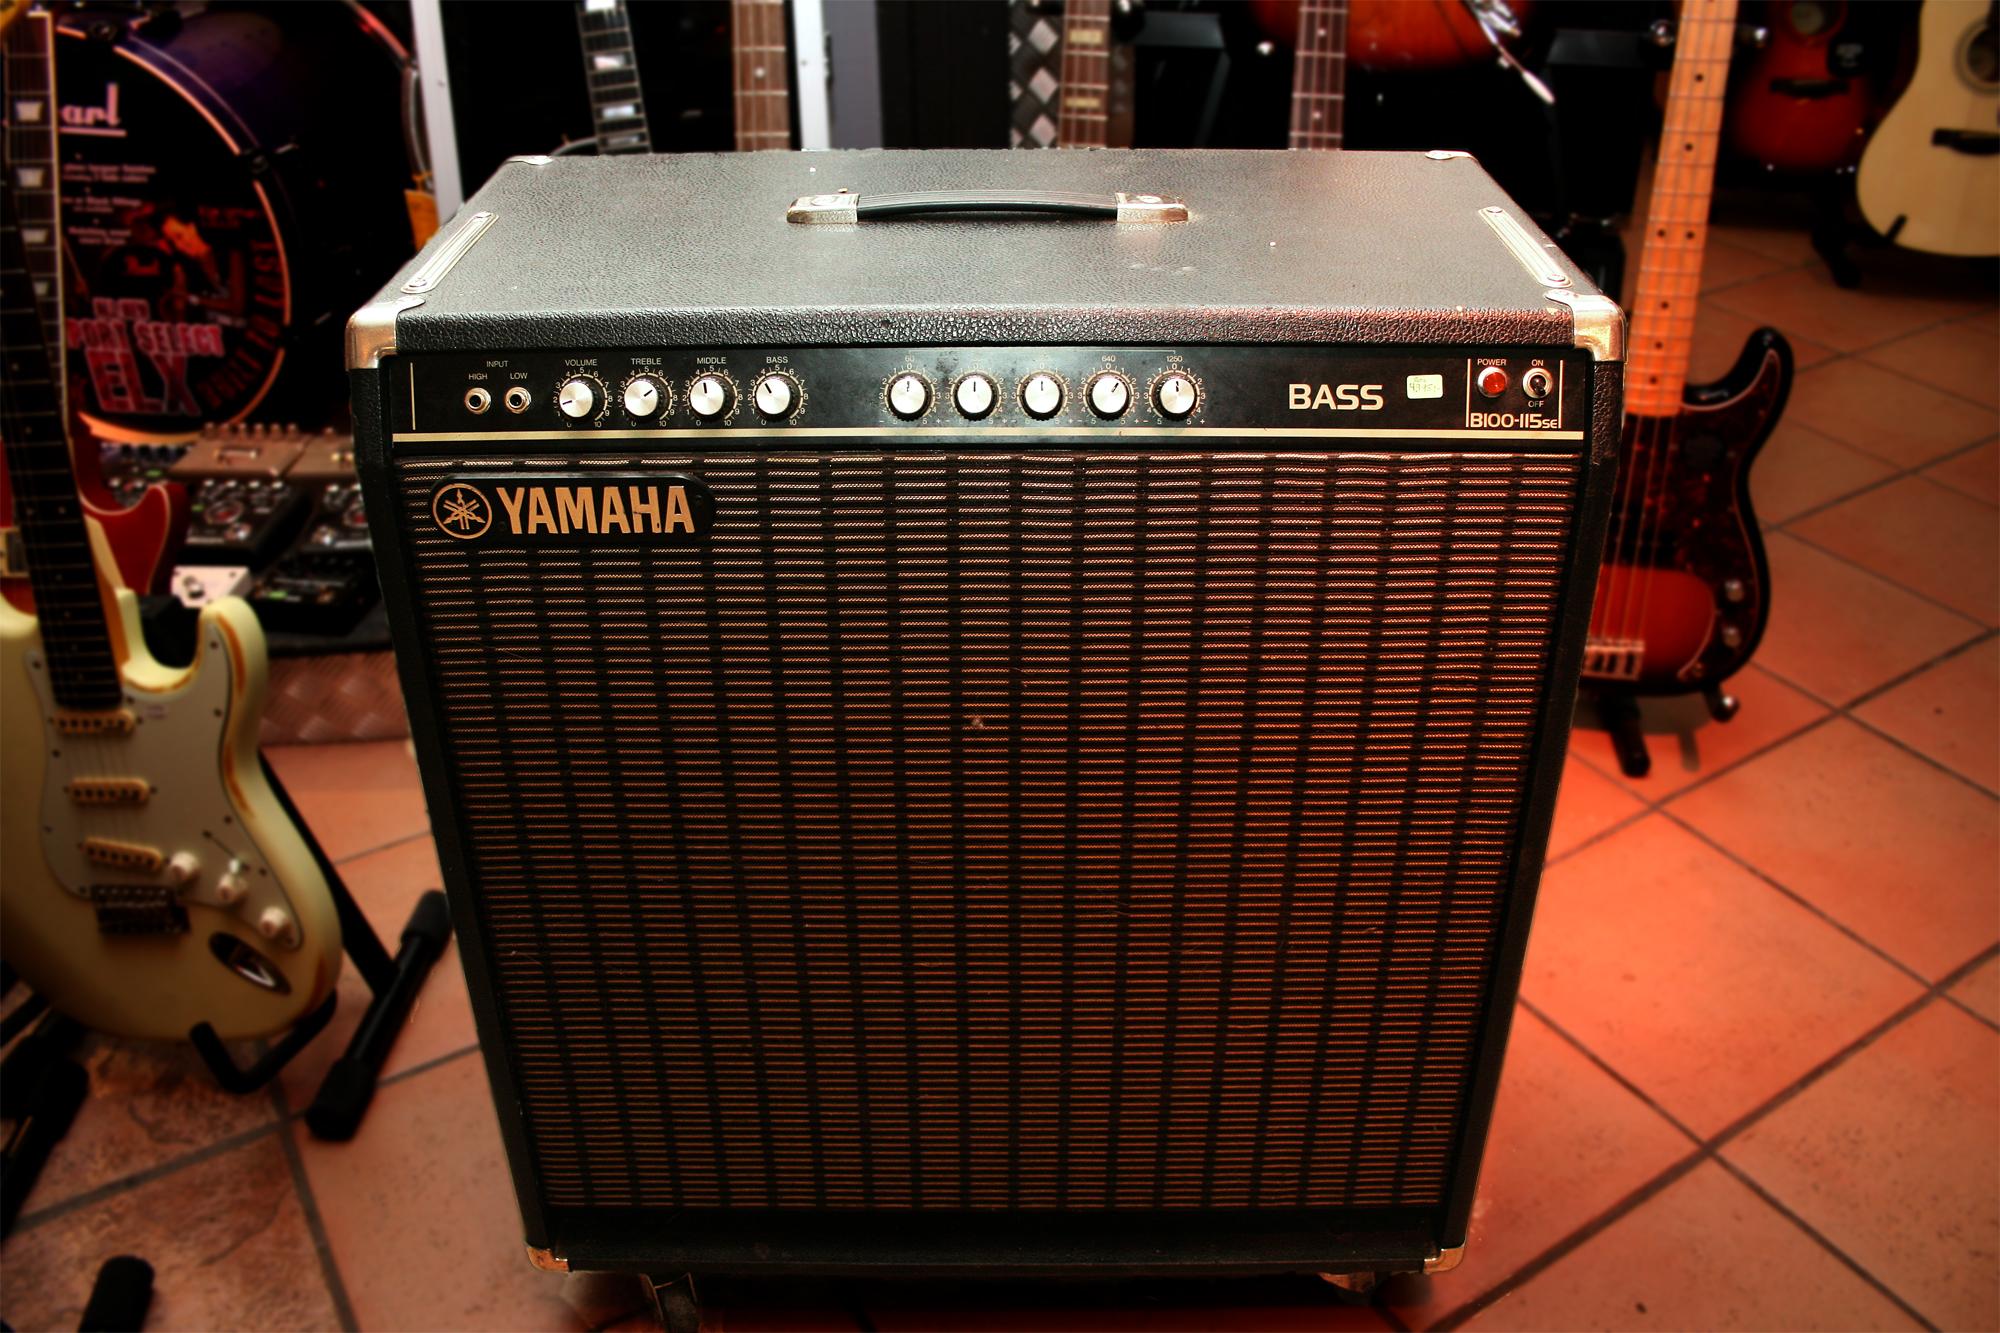 Yamaha Guitar Amplifier Model Ga